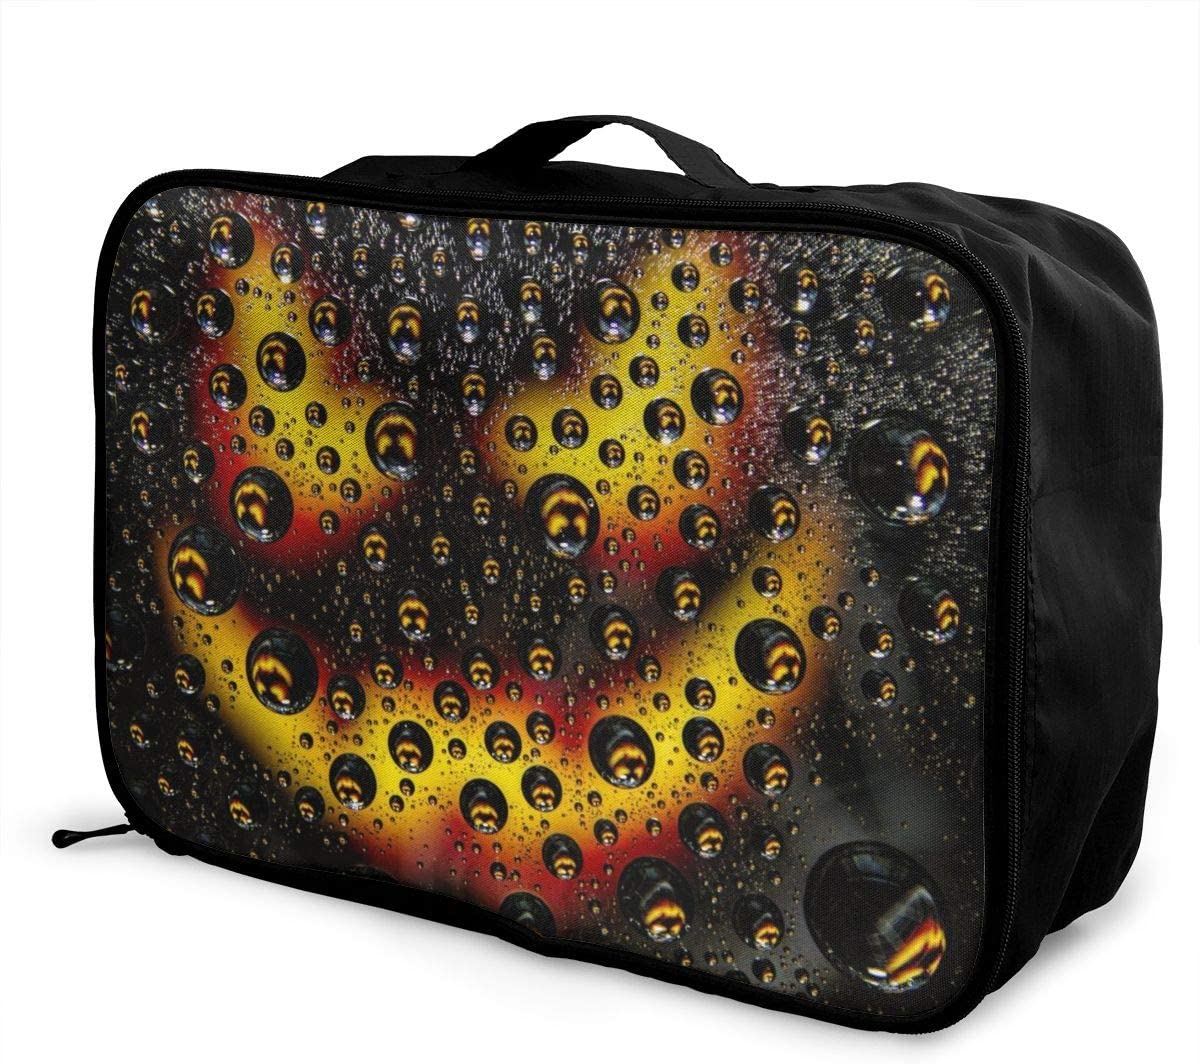 Yunshm Bubbles Drops Macro Surface Wallpaper Background Customized Trolley Handbag Waterproof Unisex Large Capacity For Business Travel Storage